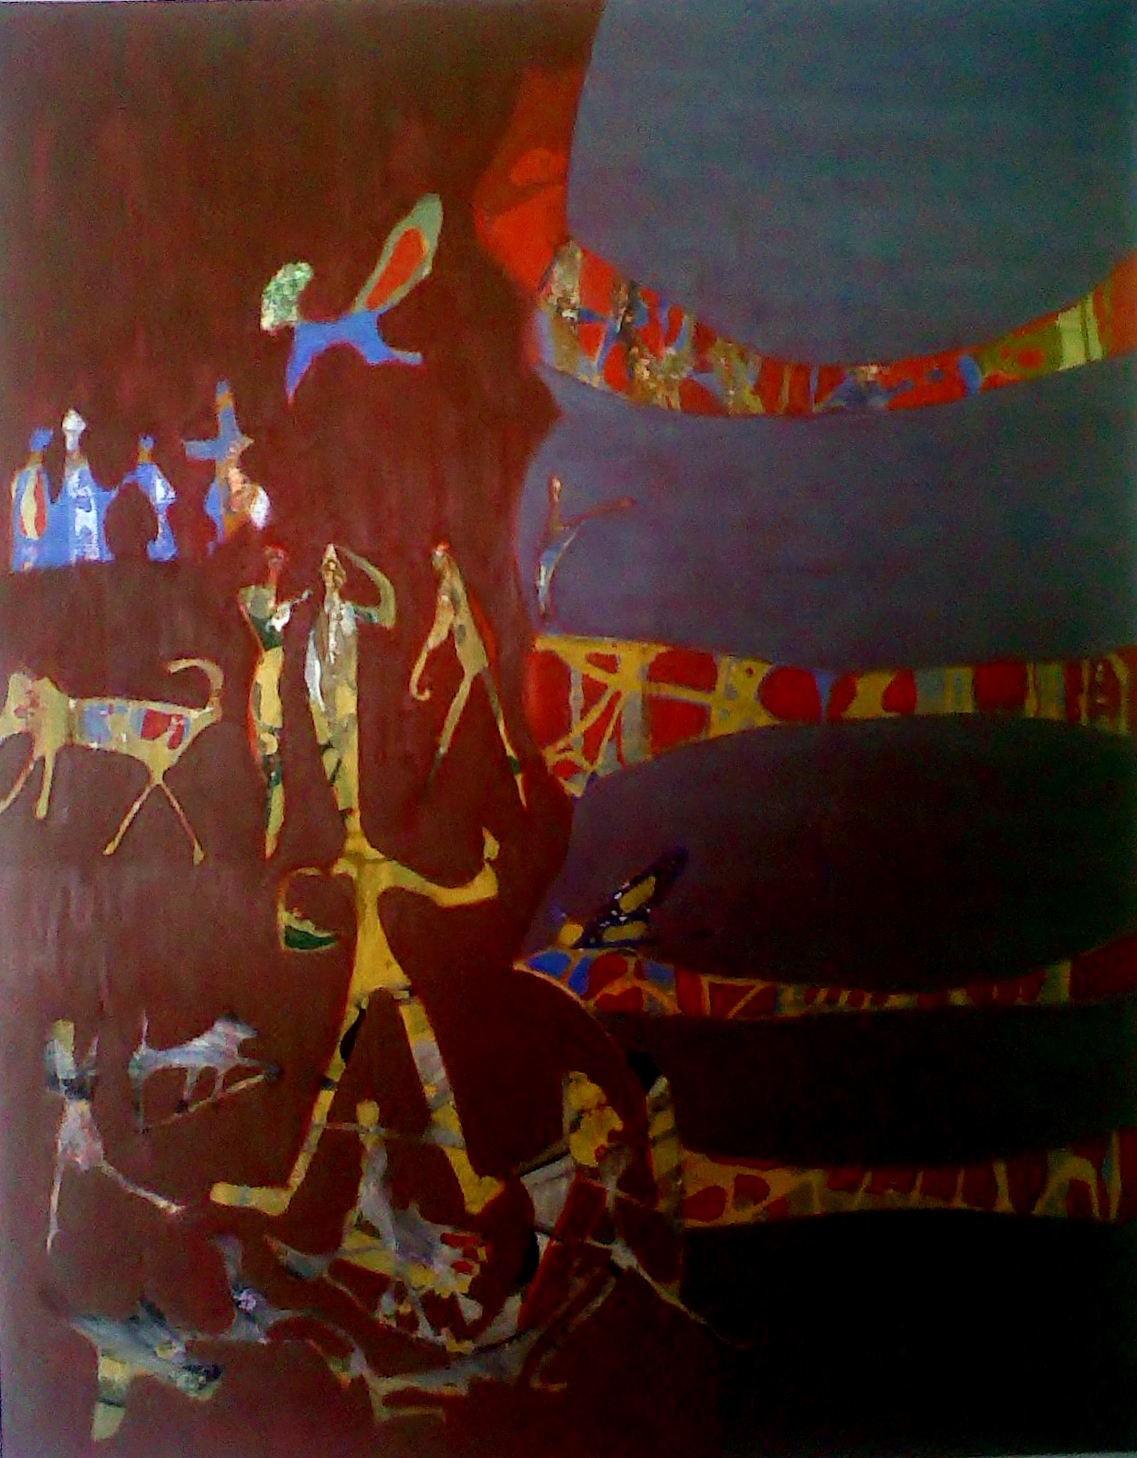 Cuatro bandas (2016) - Rodelona